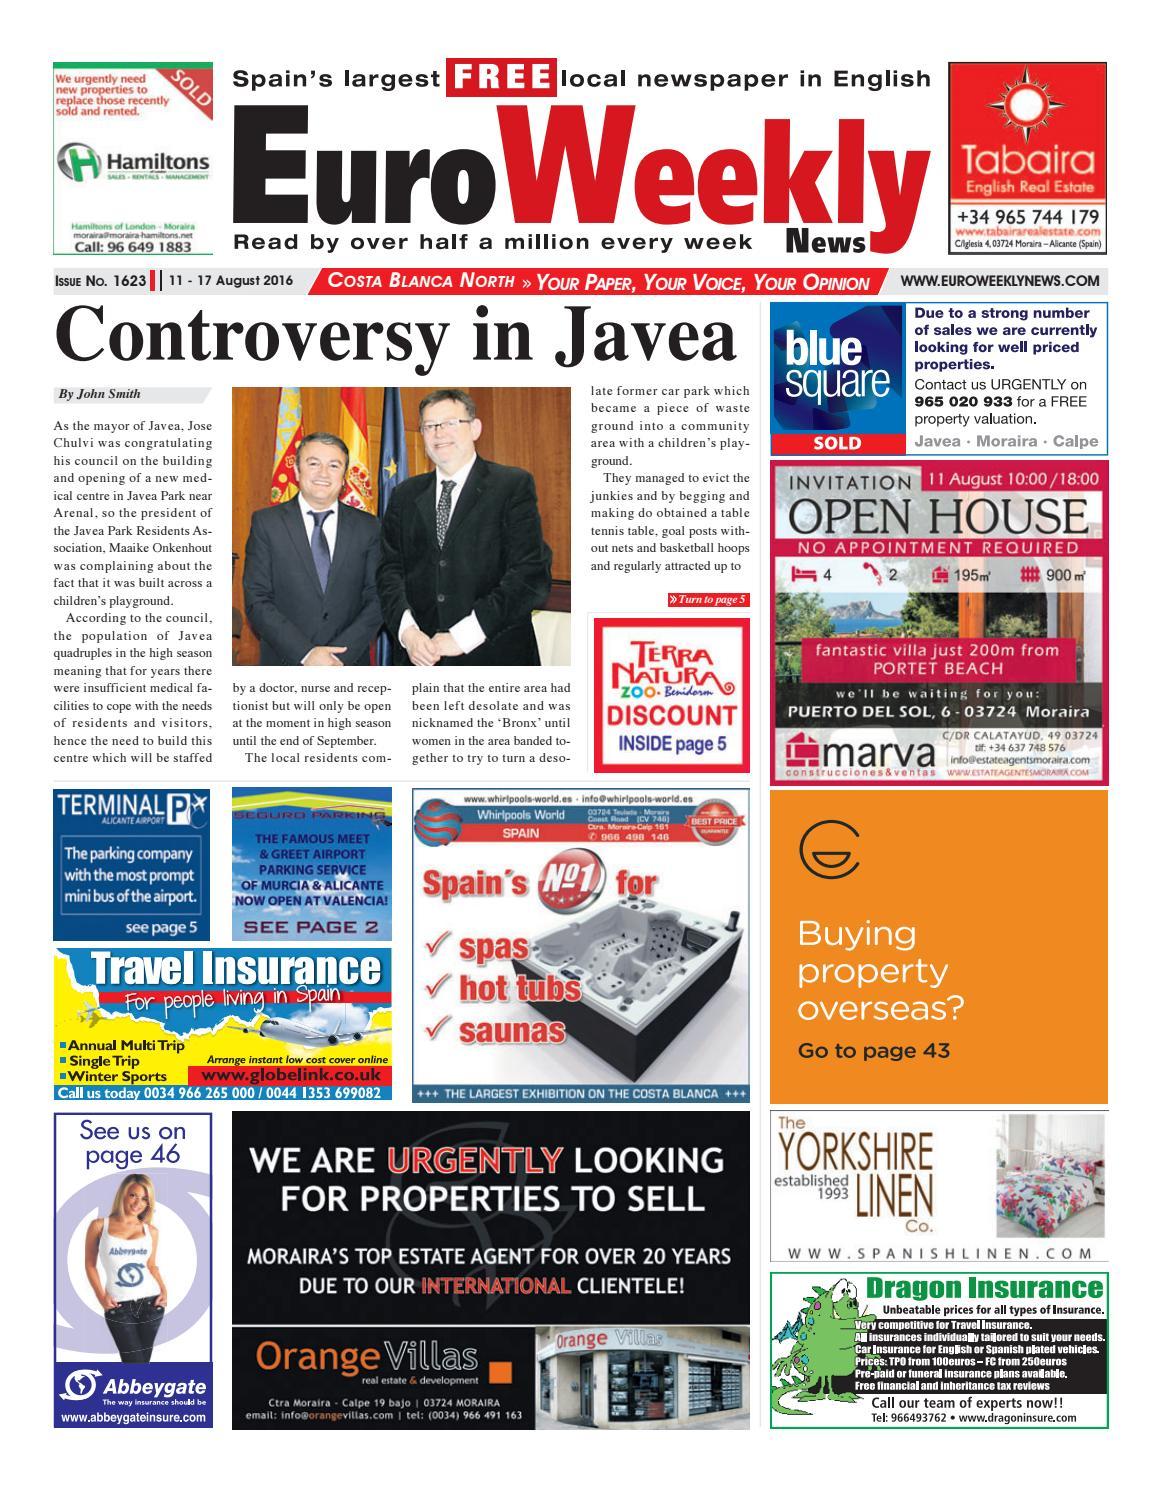 Euro Weekly News - Costa Blanca North 11 - 17 August 2016 ...